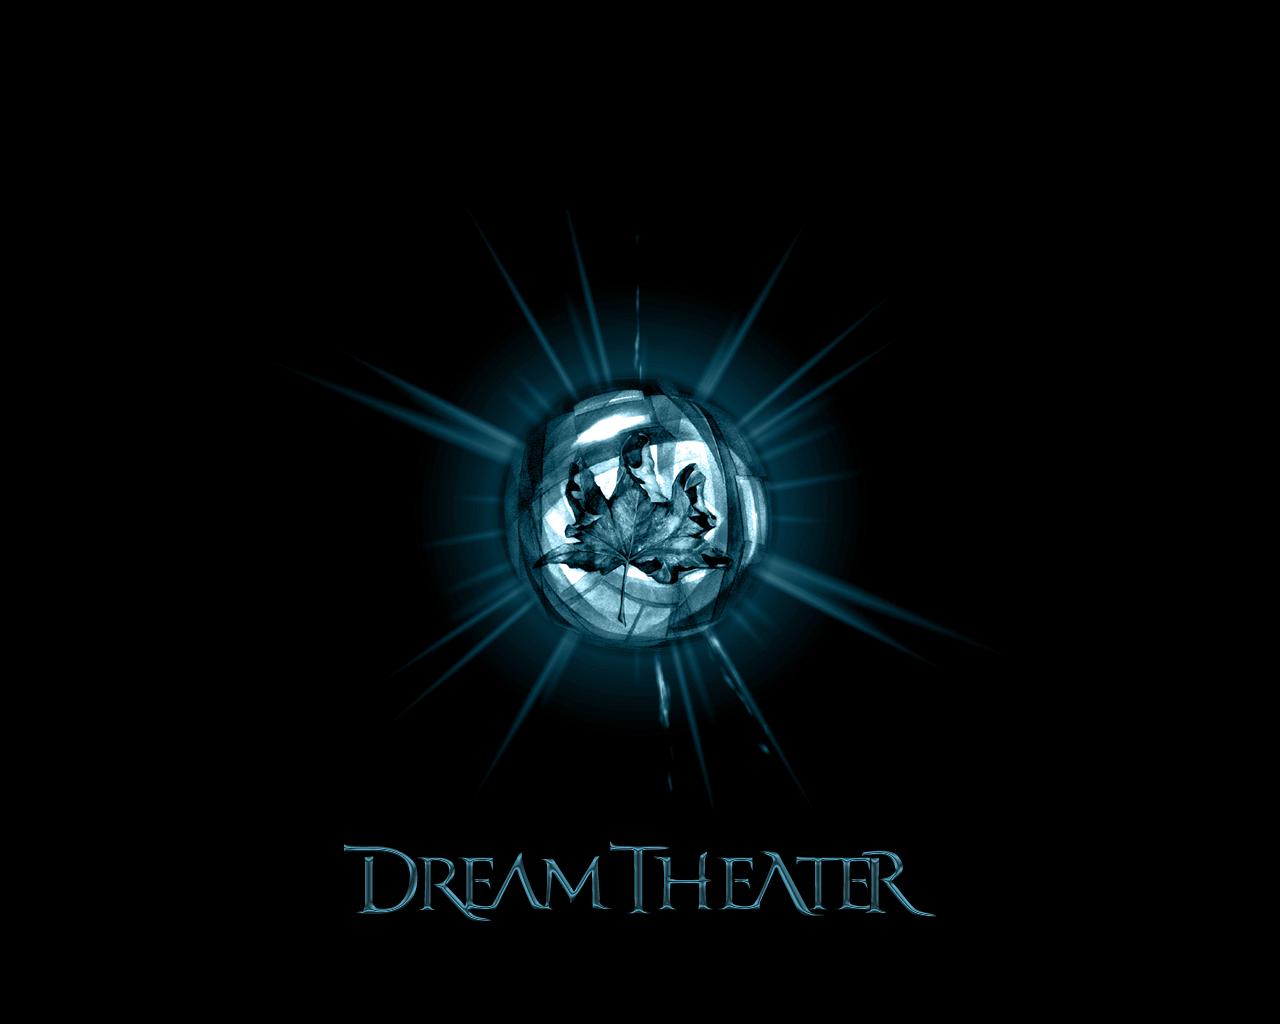 Dream Theater Computer Wallpapers Desktop Backgrounds 1280x1024 1280x1024